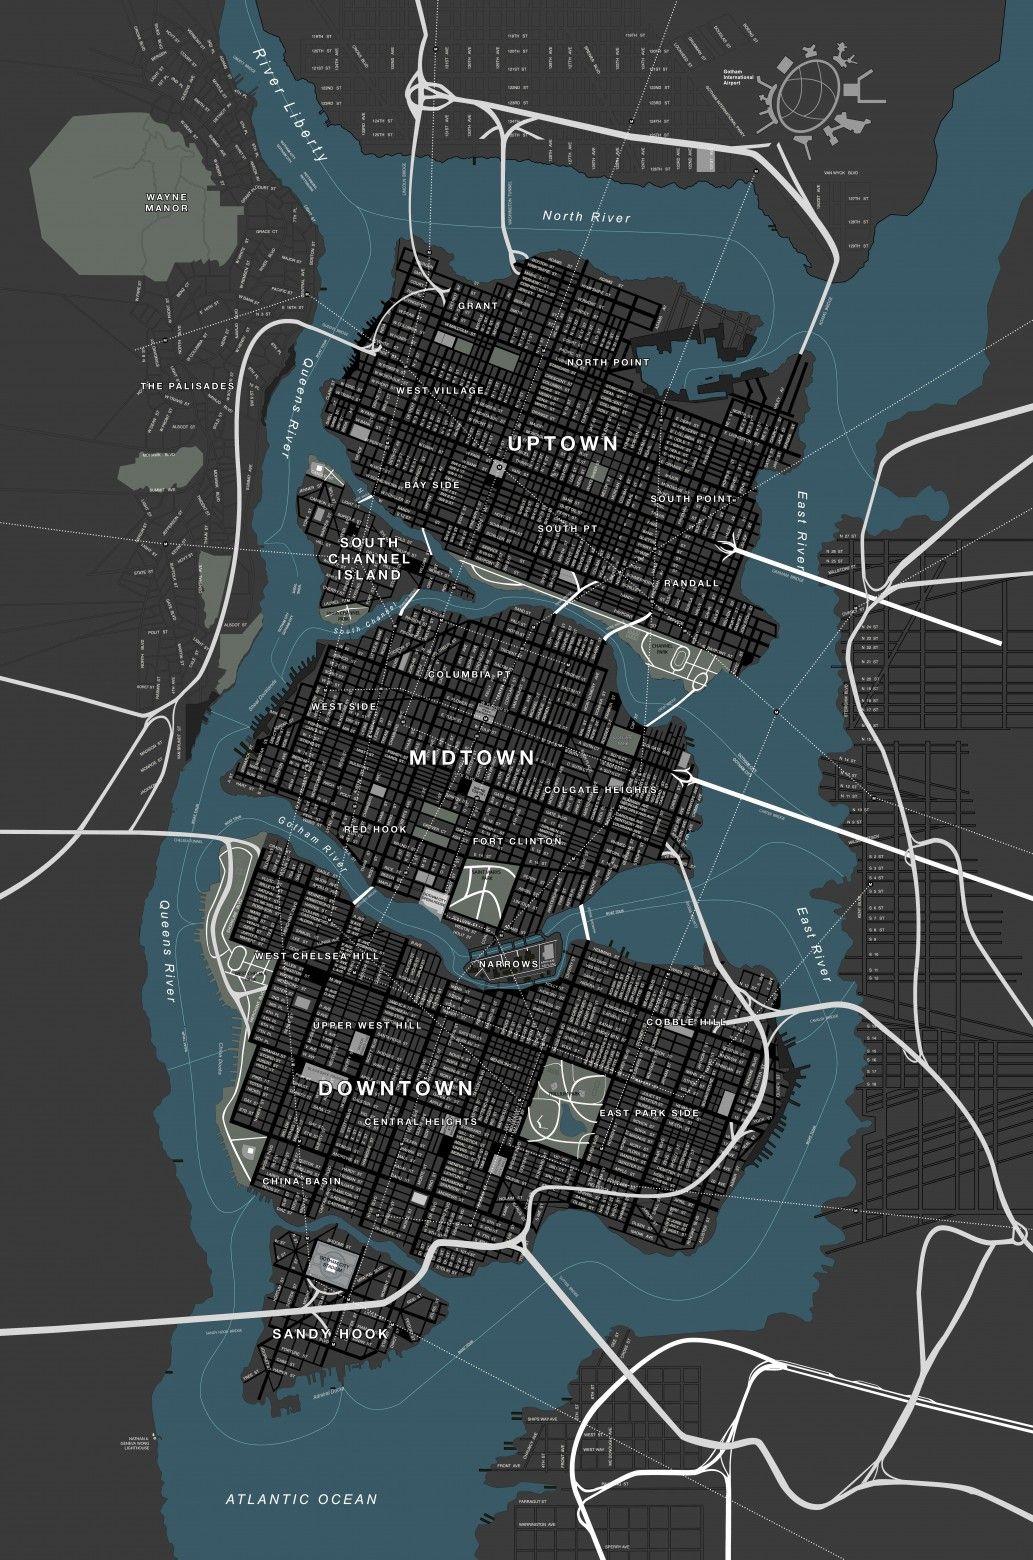 Gotham City as seen in the Nolan